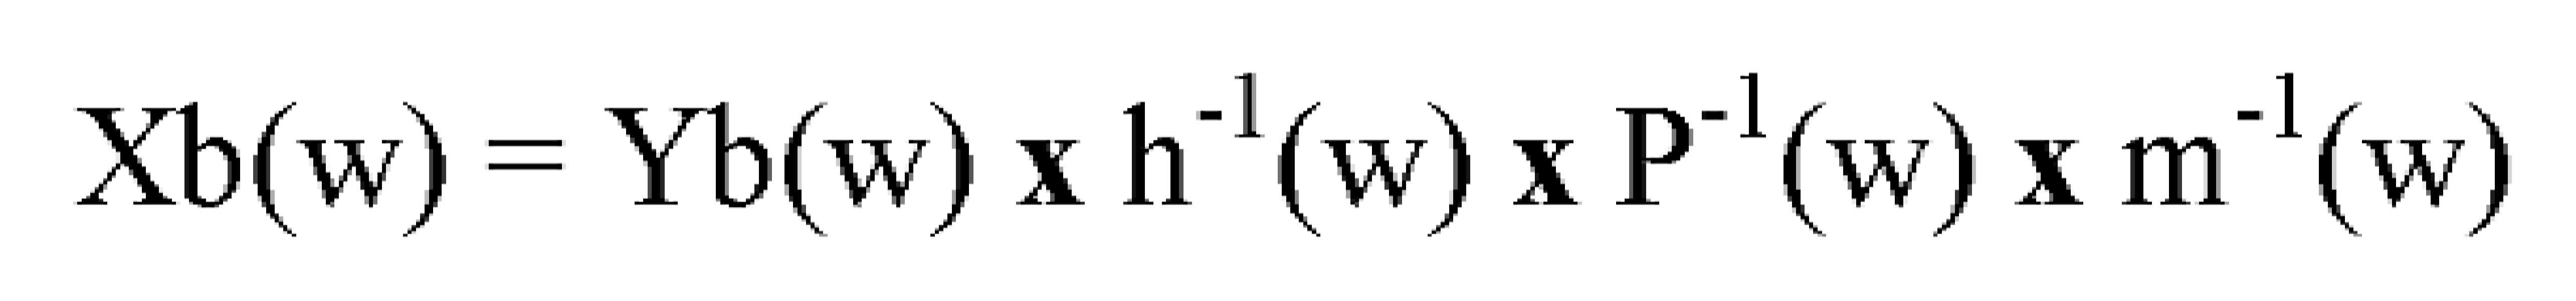 Figure 112018103574744-pct00003